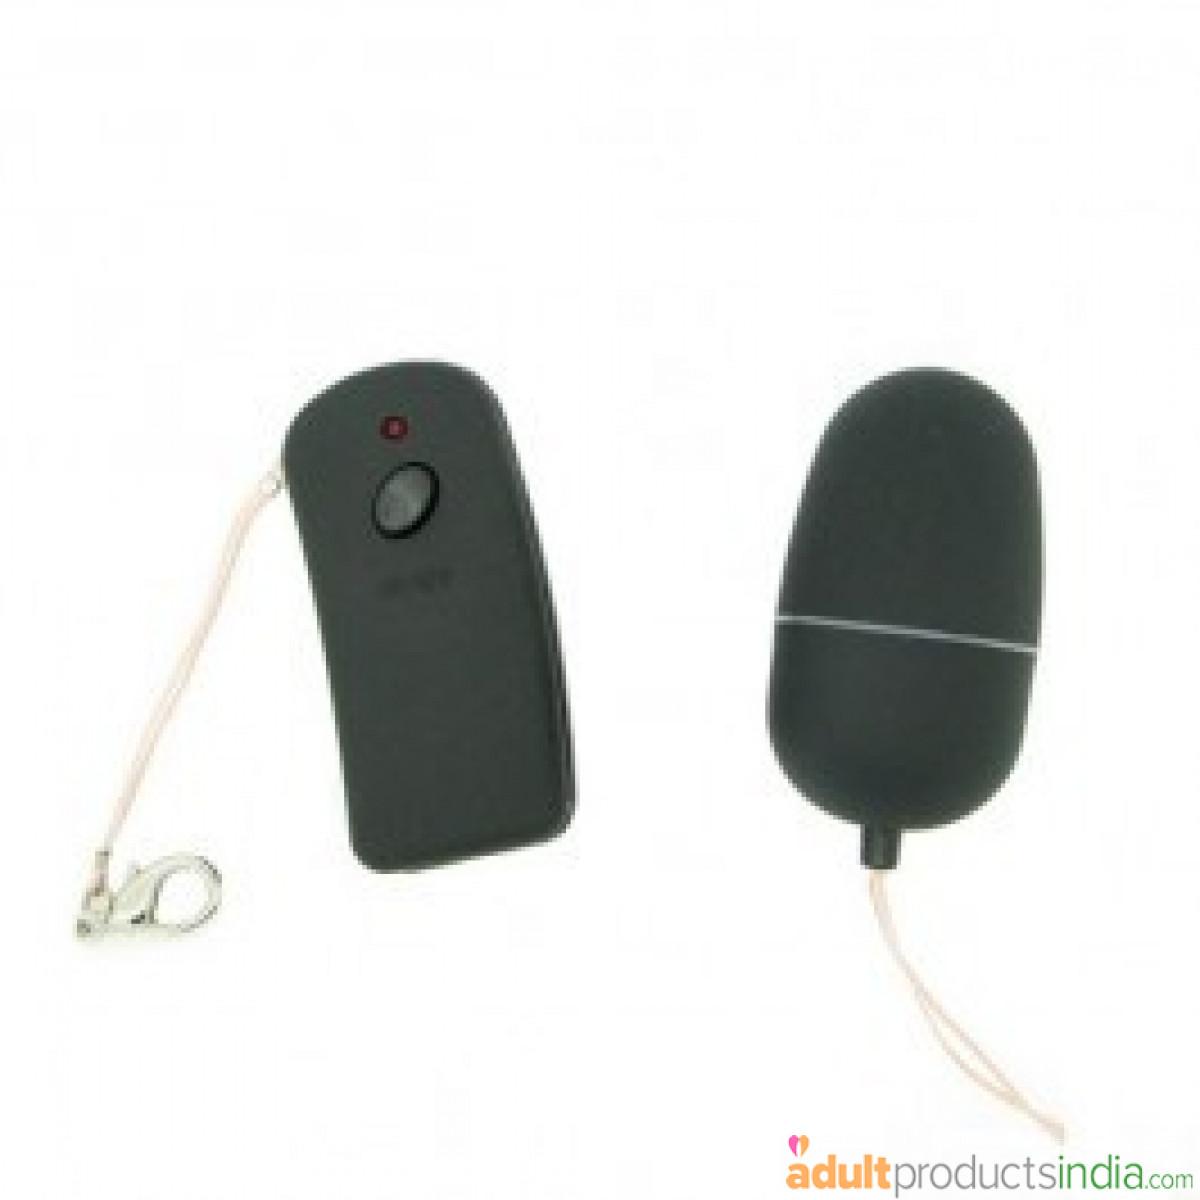 10 Speeds Remote Control